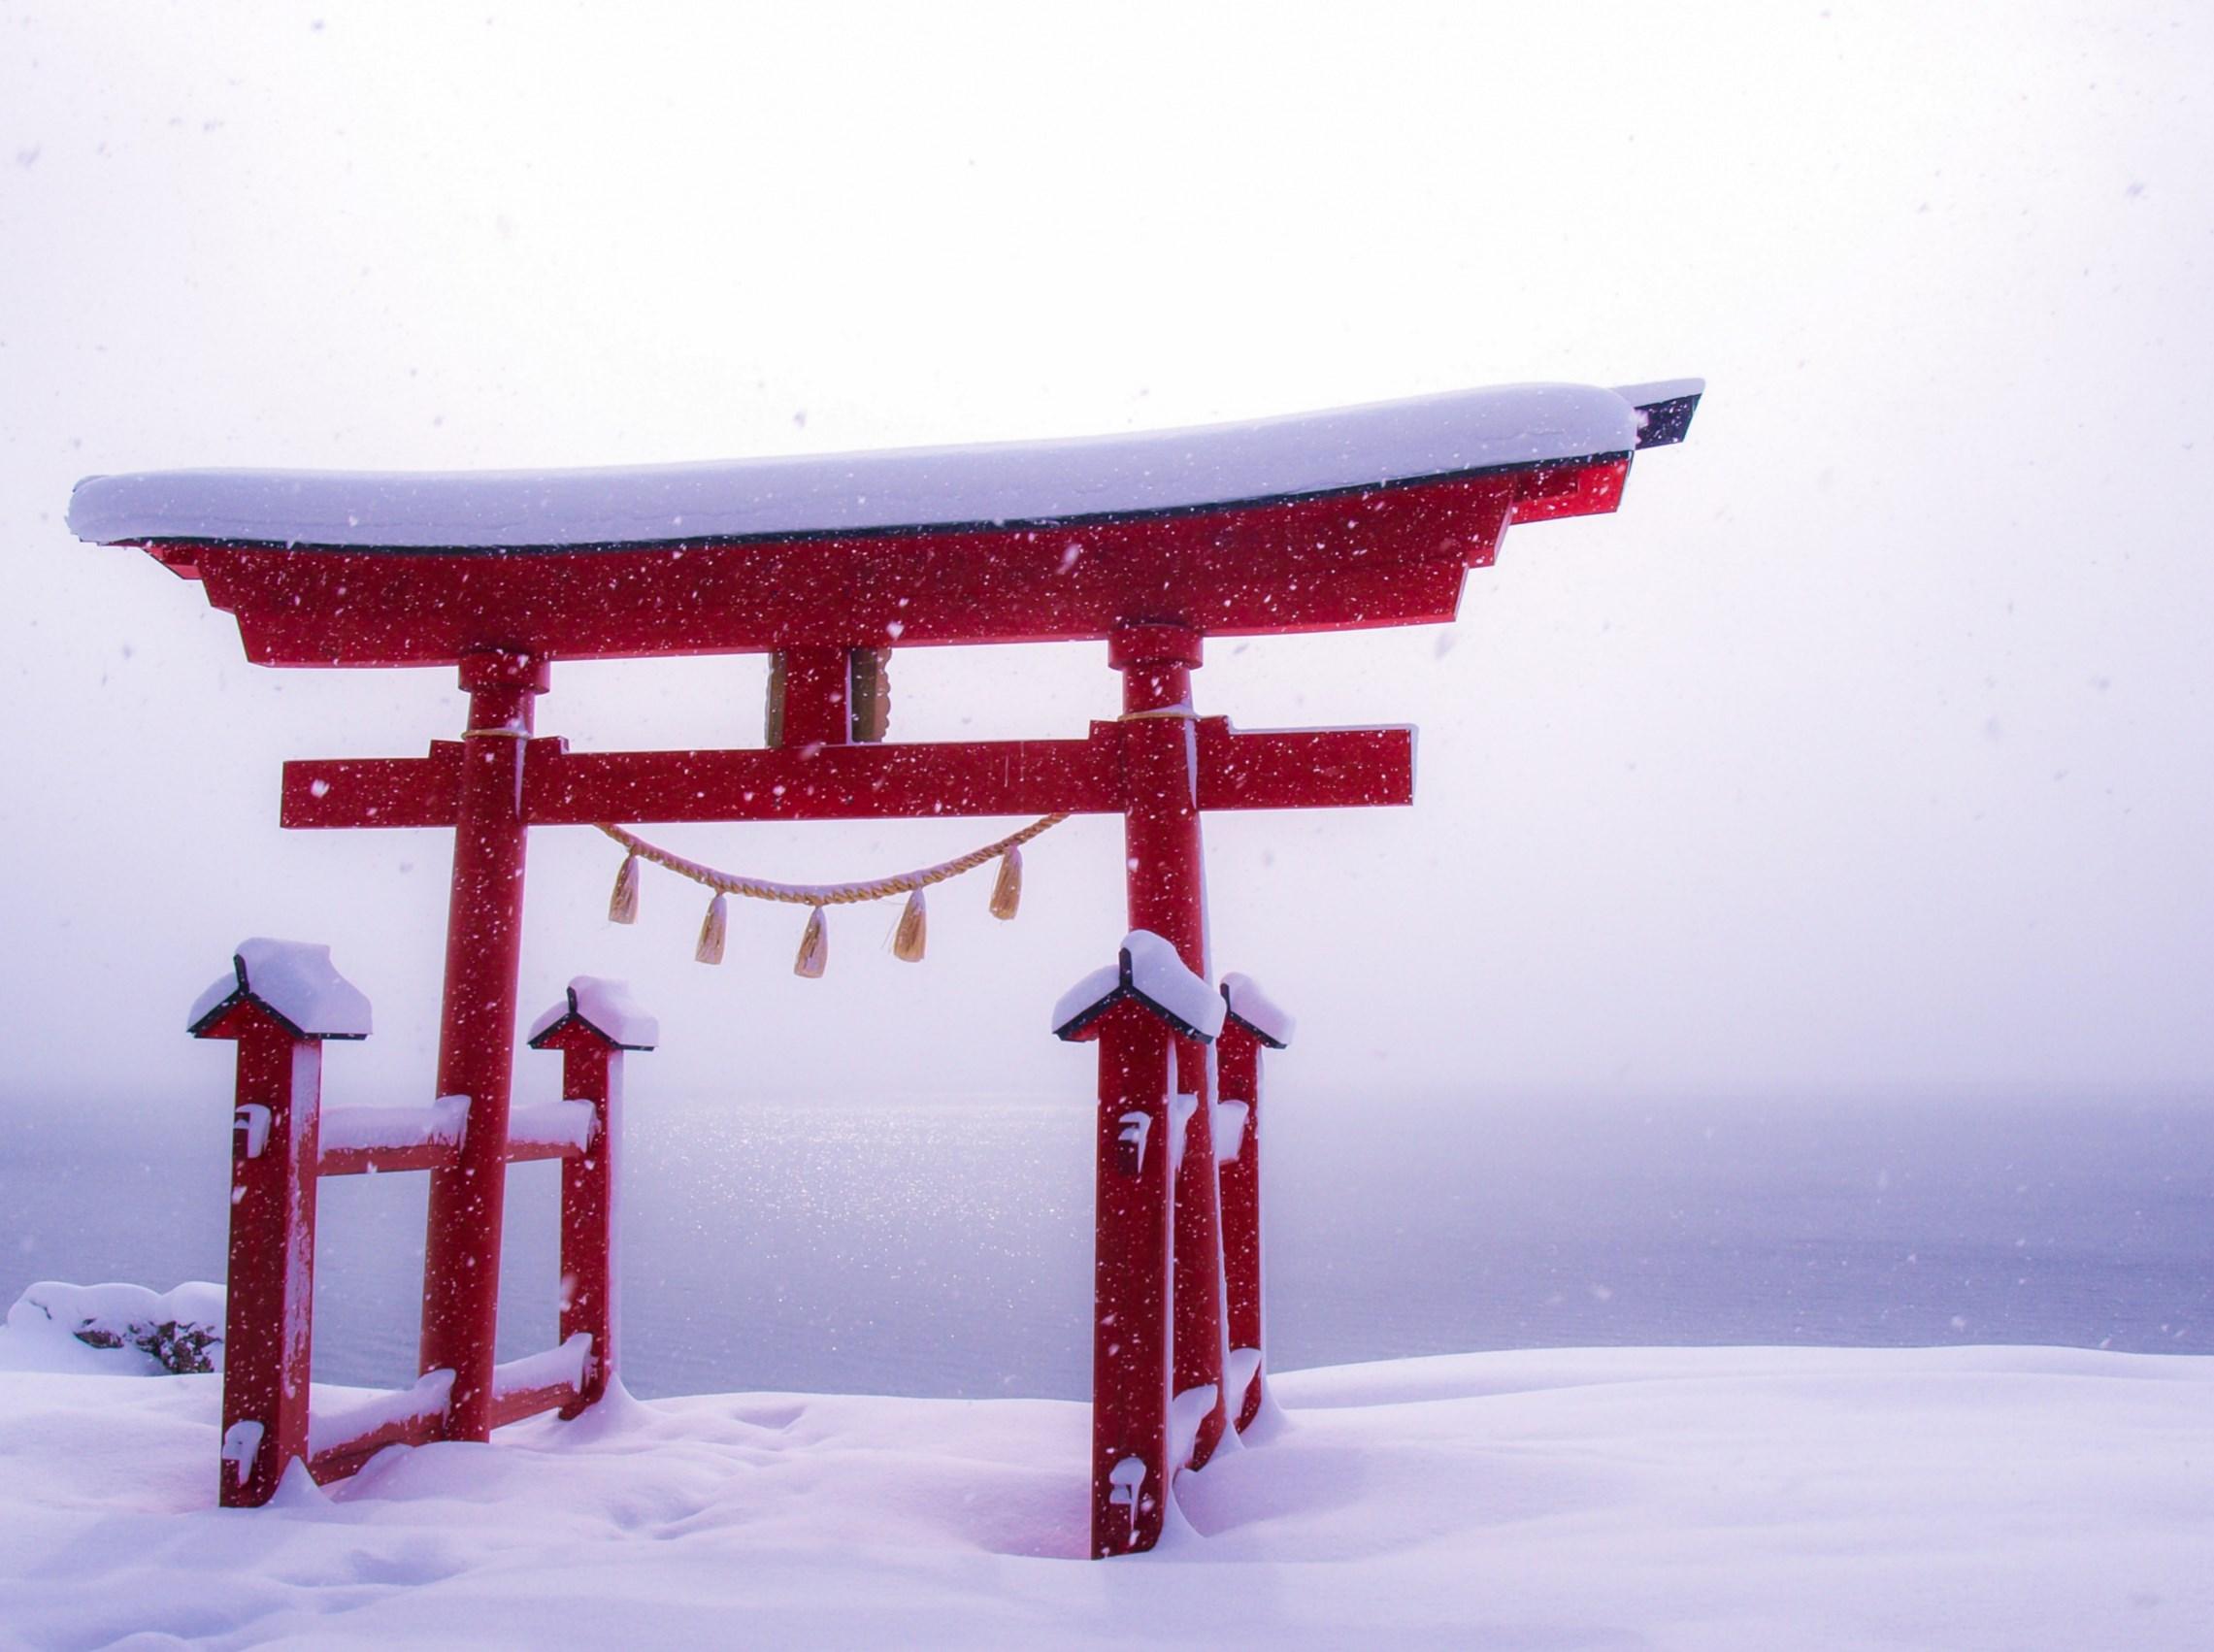 Snowy lakeside. Foto de Syuzo Tsushima